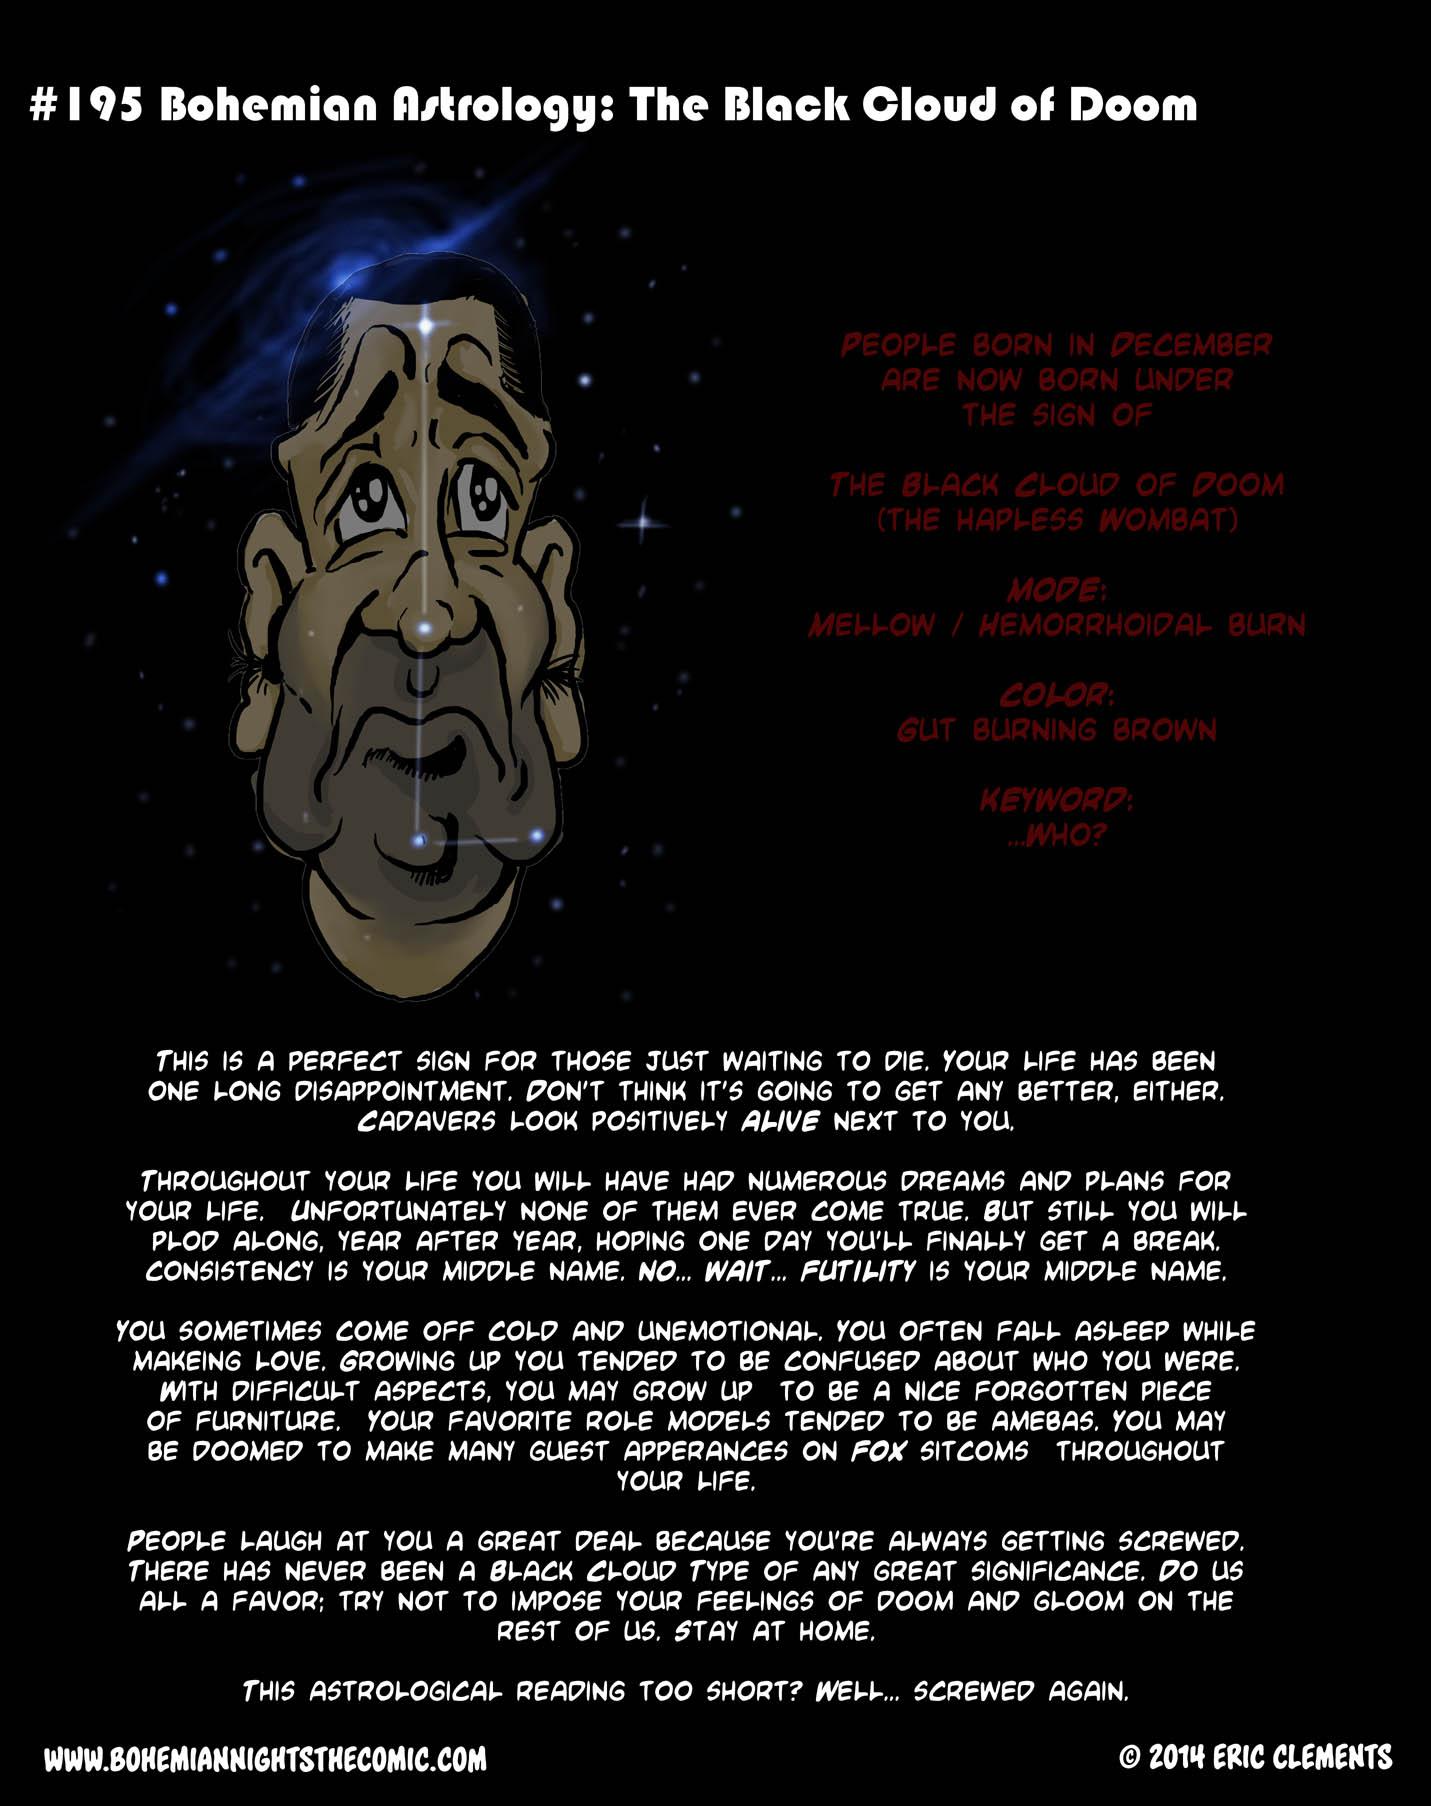 #195 Bohemian Astrology: The Black Cloud of Doom